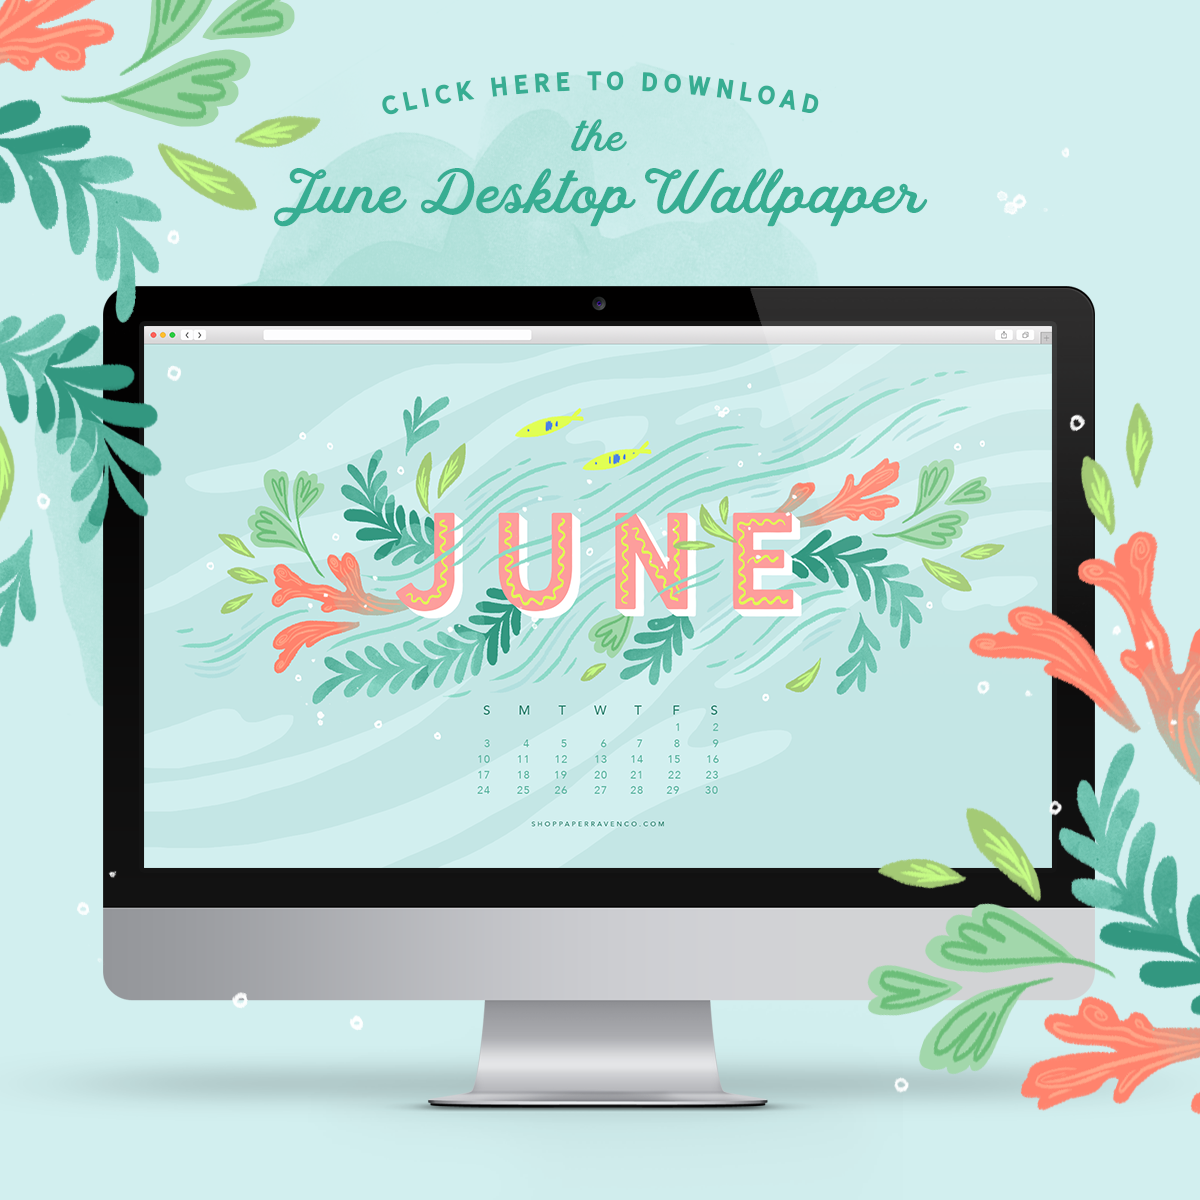 June 2018 Illustrated Desktop Wallpaper